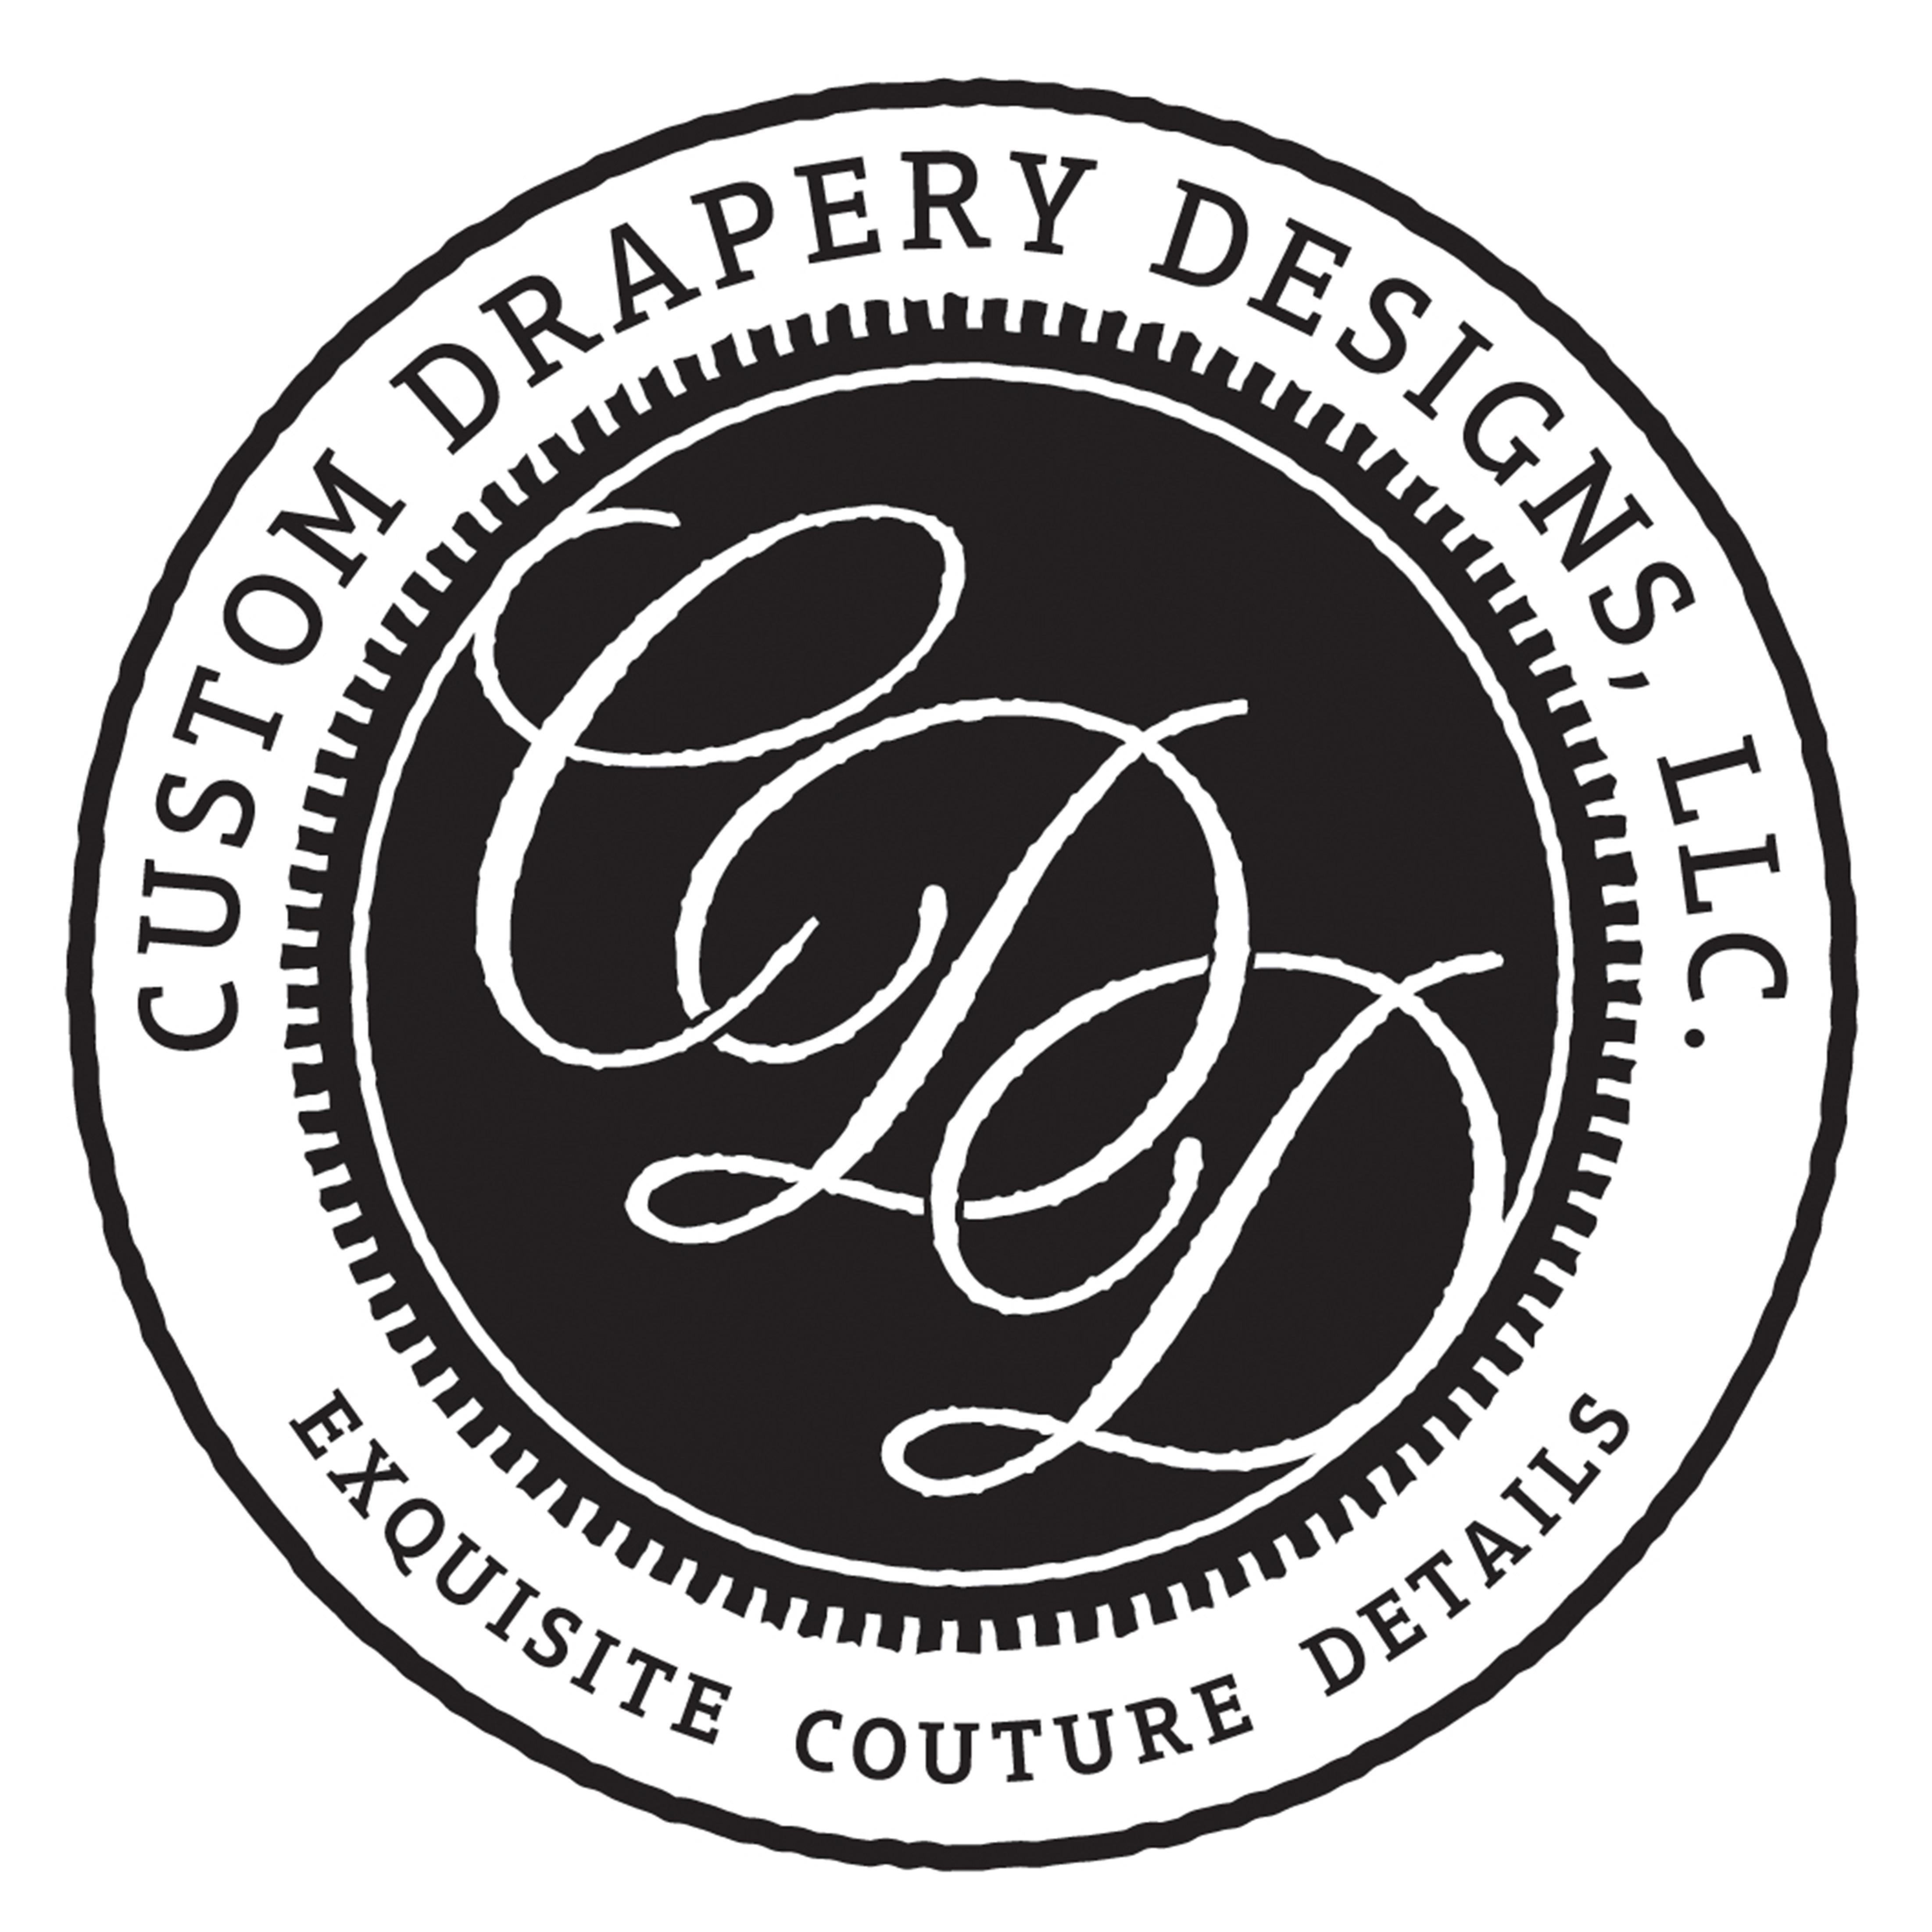 Custom Drapery Designs, LLC